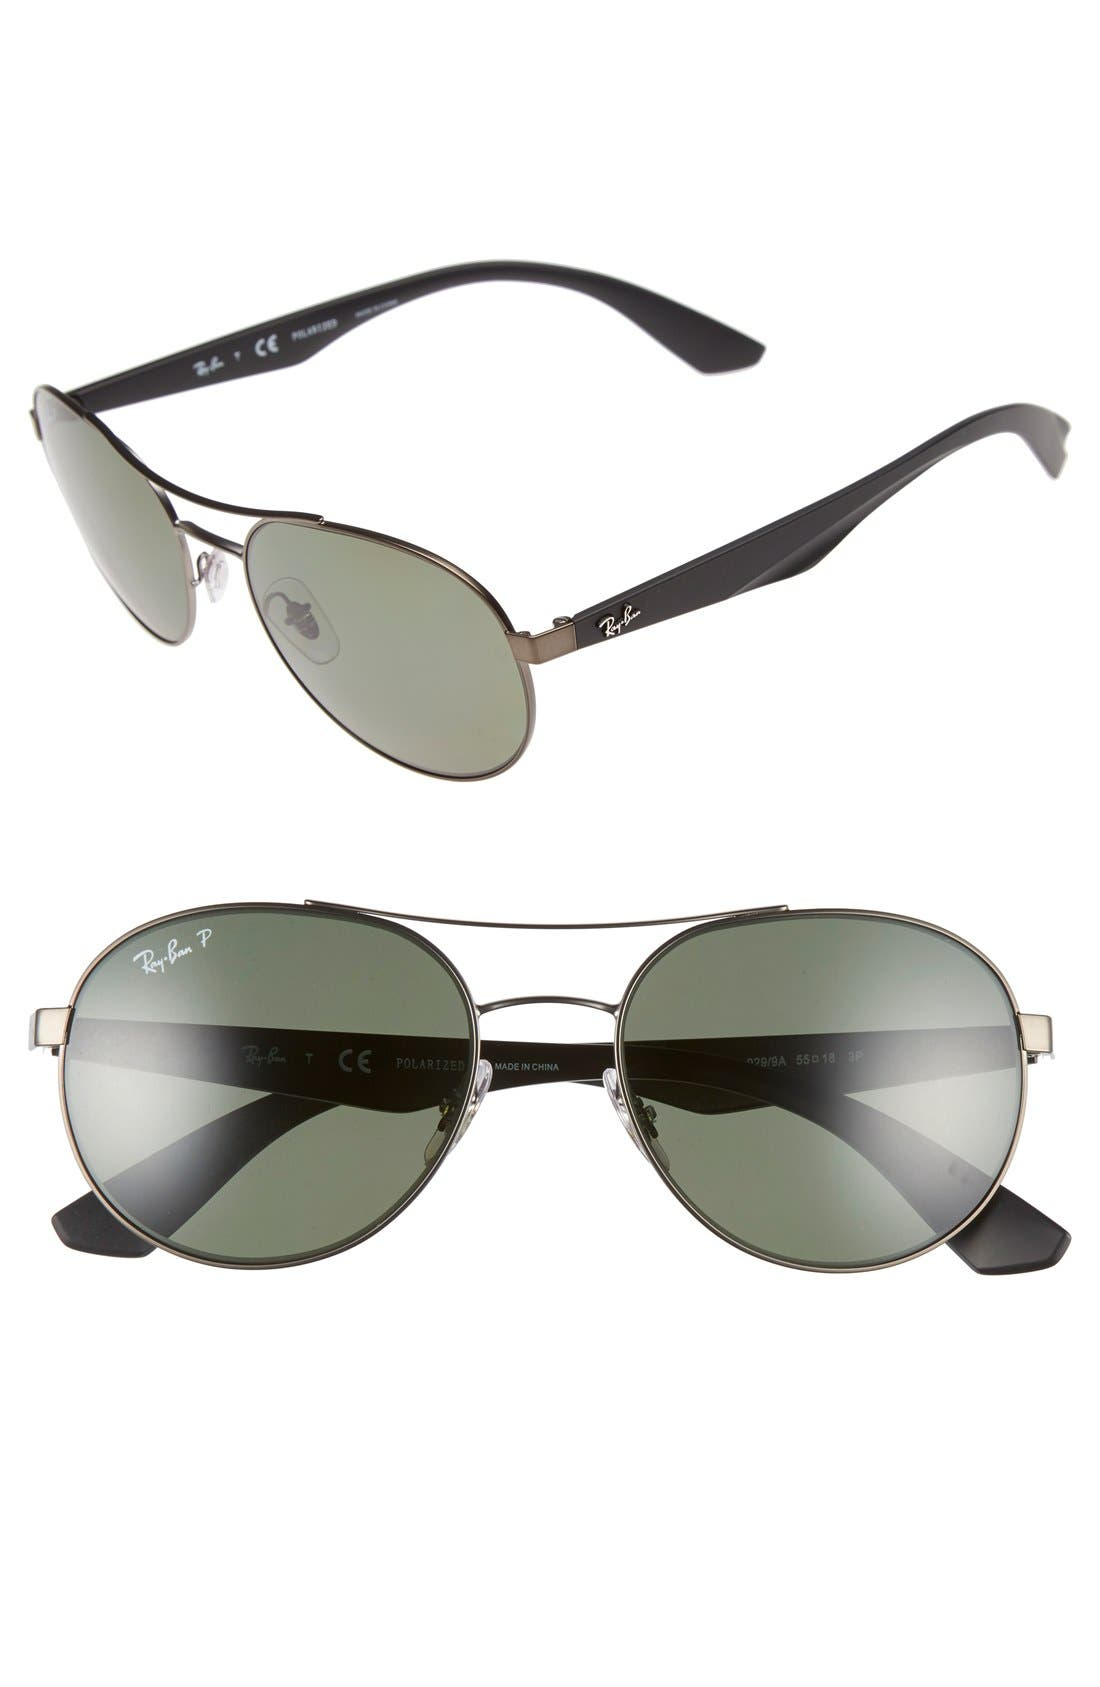 55mm Polarized Sunglasses,                         Main,                         color, MATTE GUNMETAL/ GREEN P